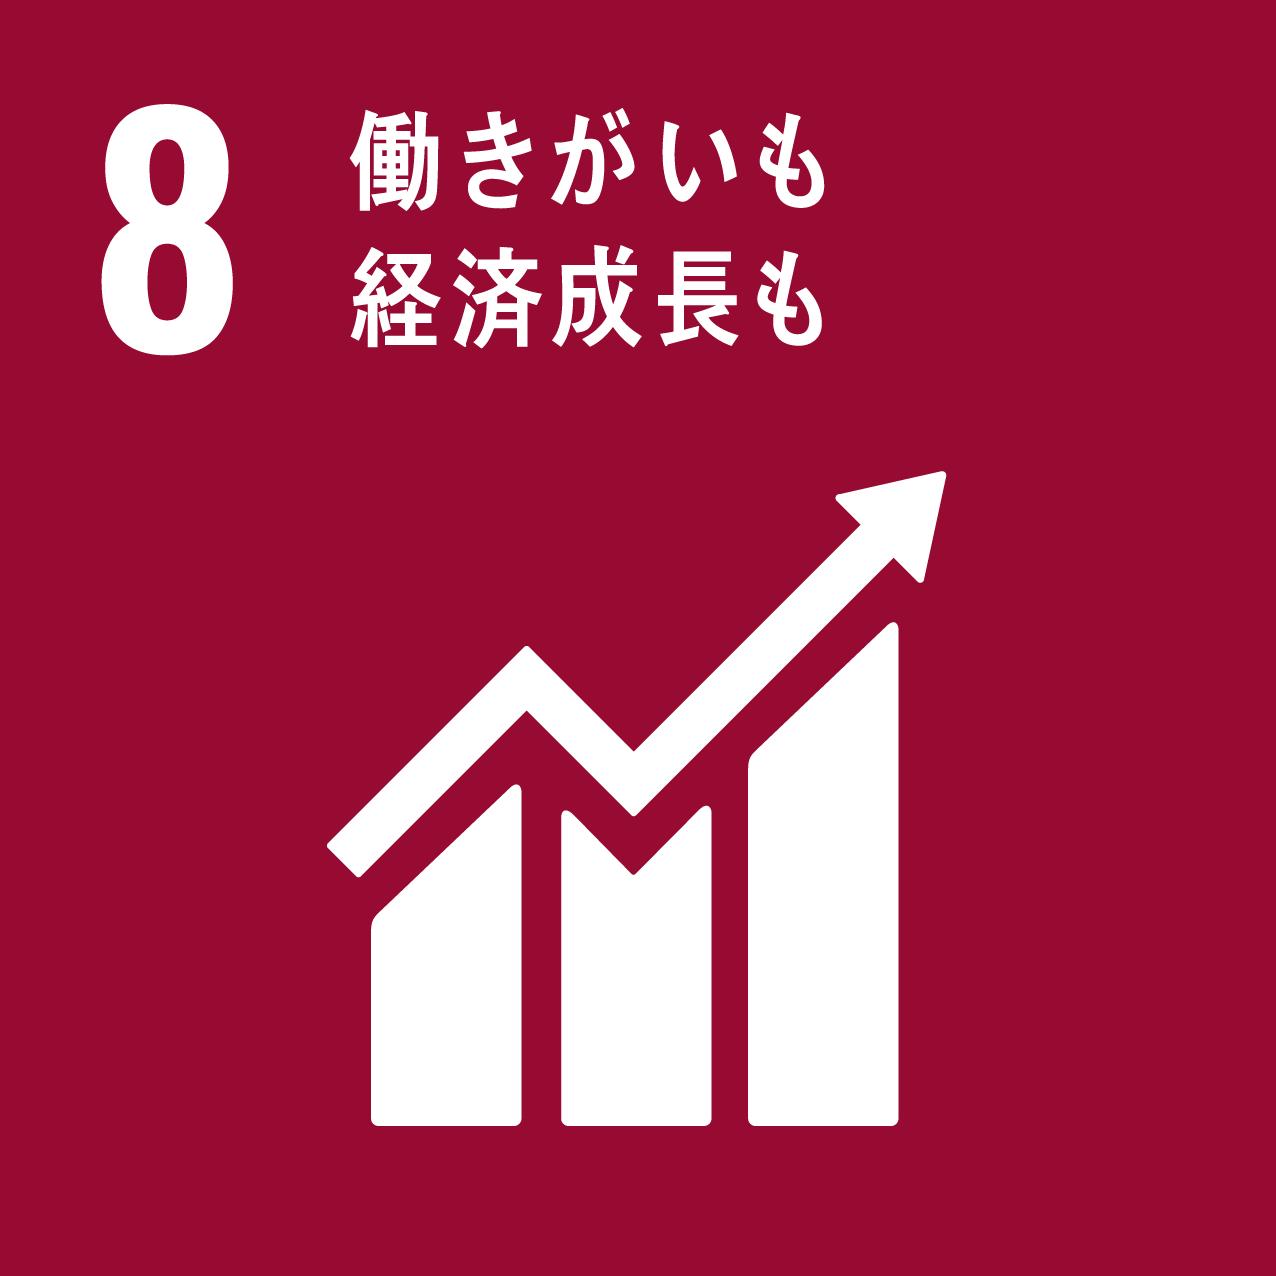 SDGsの8つ目の目標